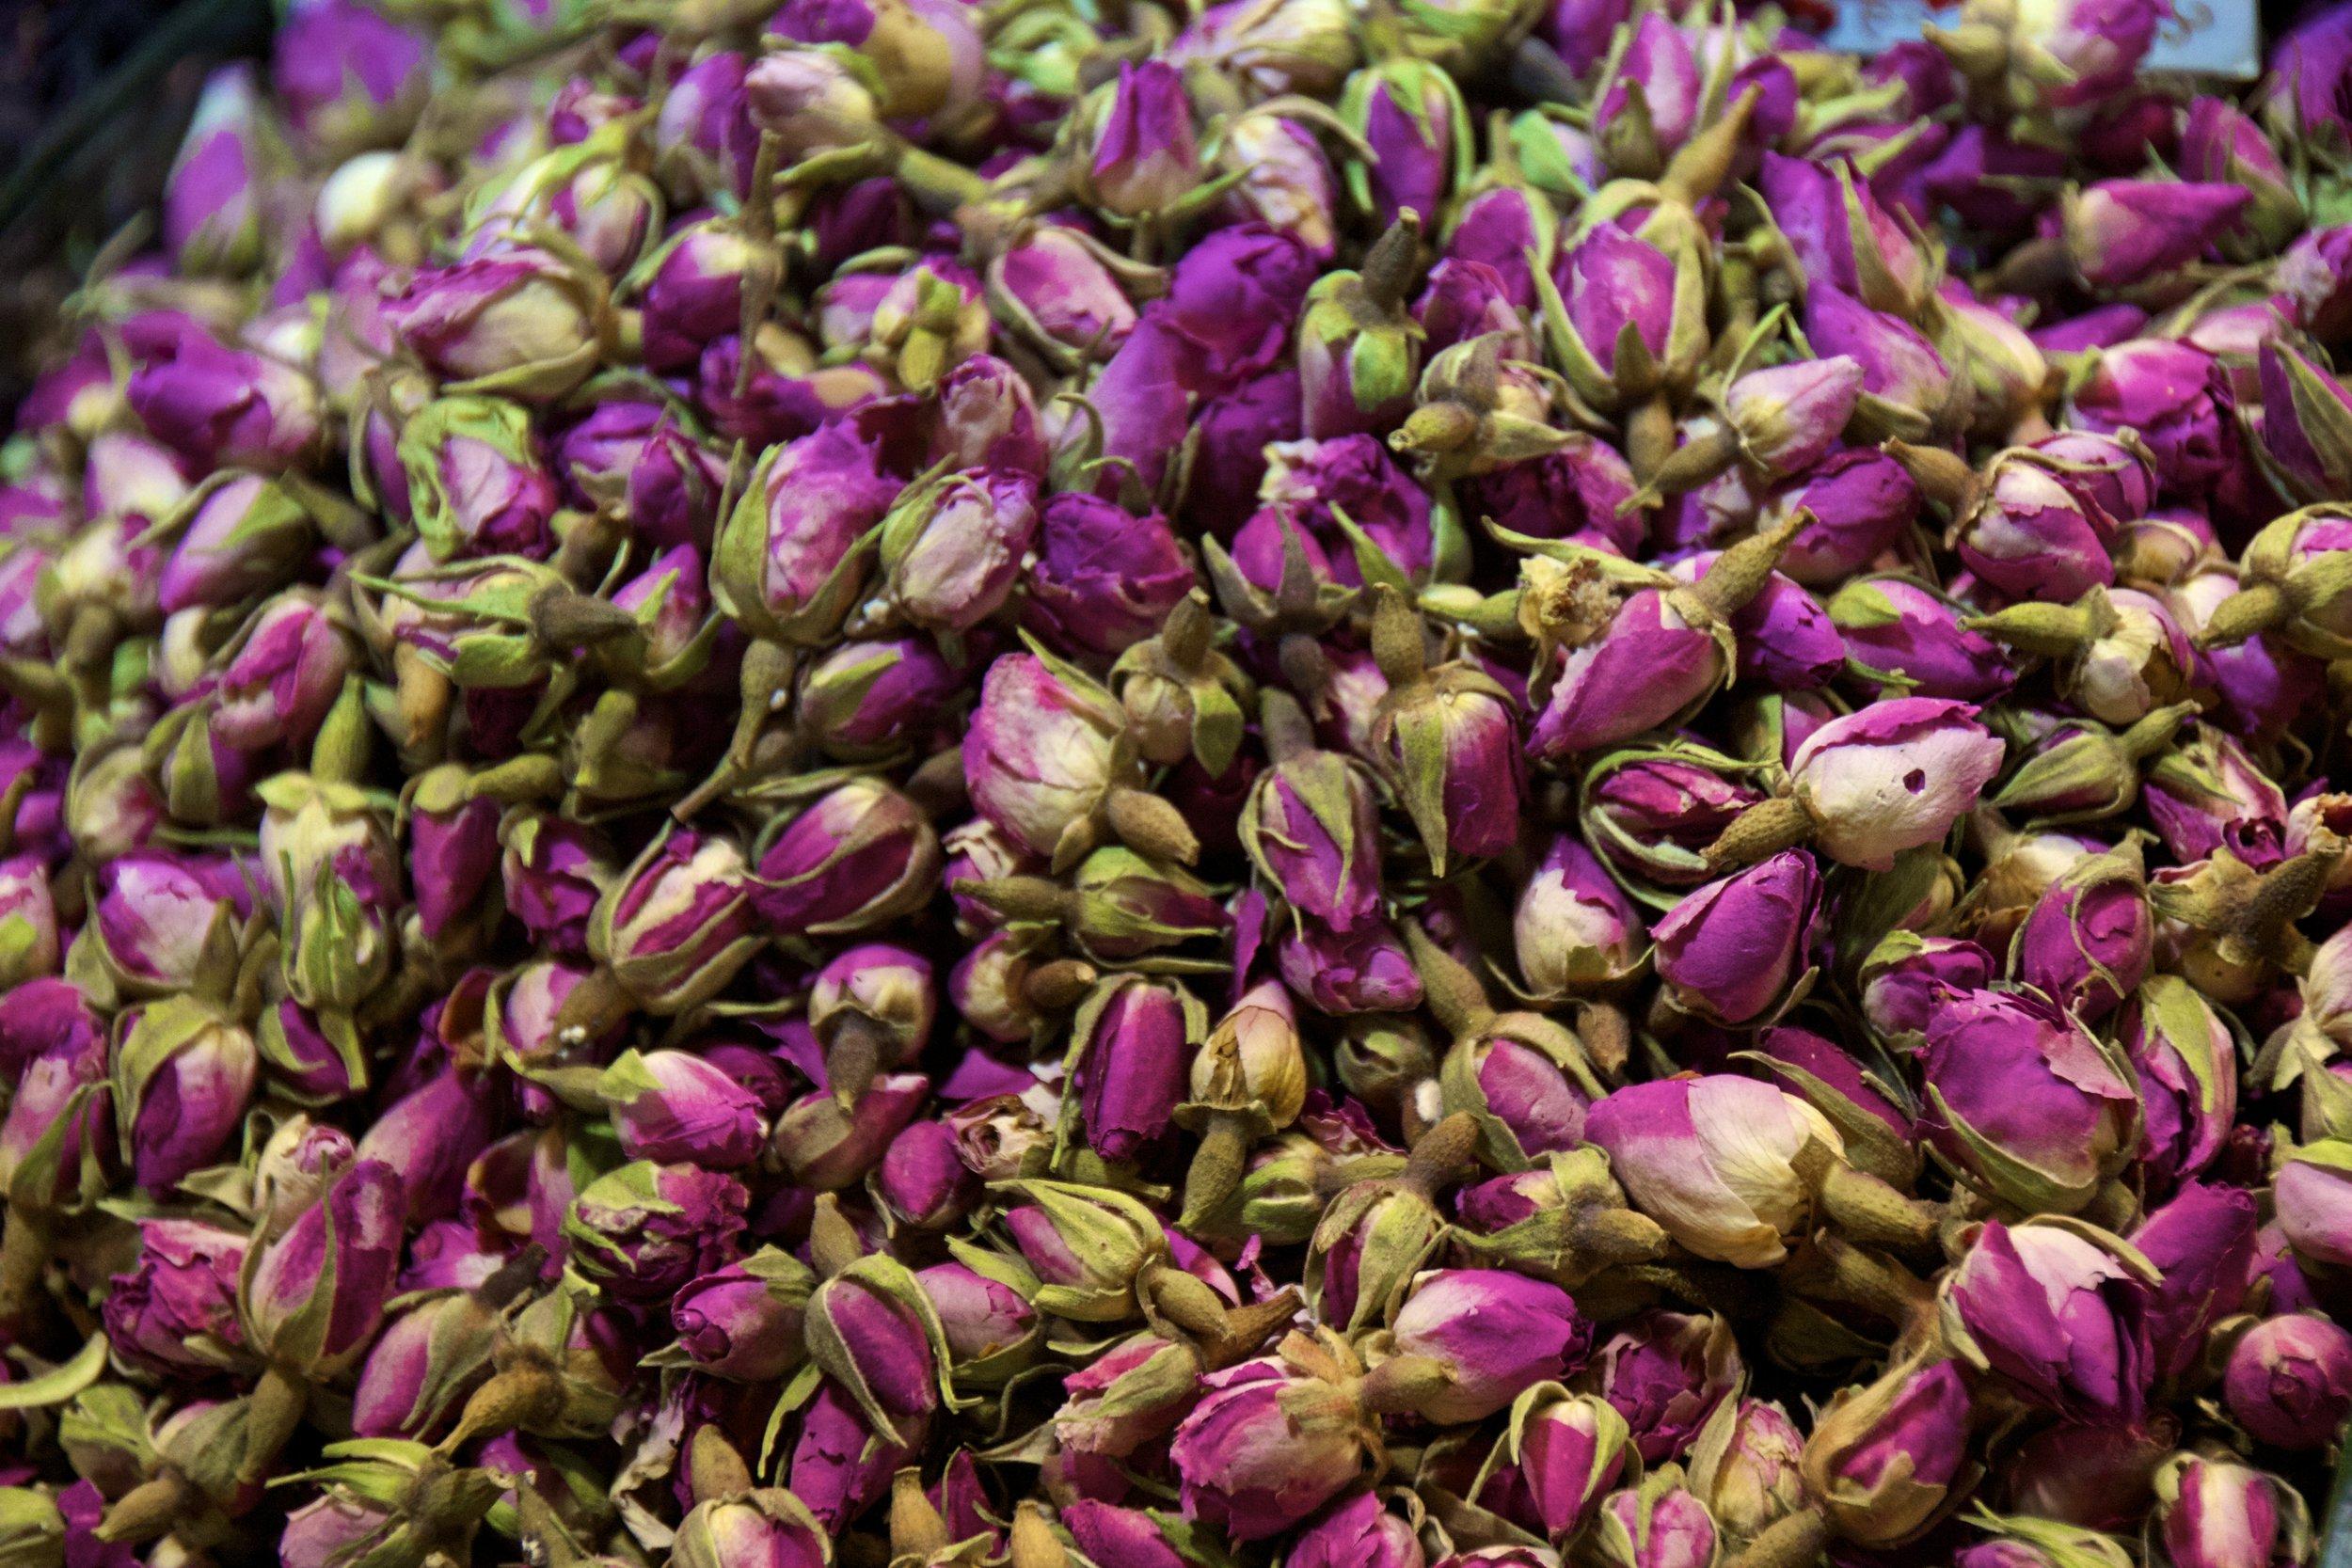 spice bazaar istanbul turkey 11.jpg